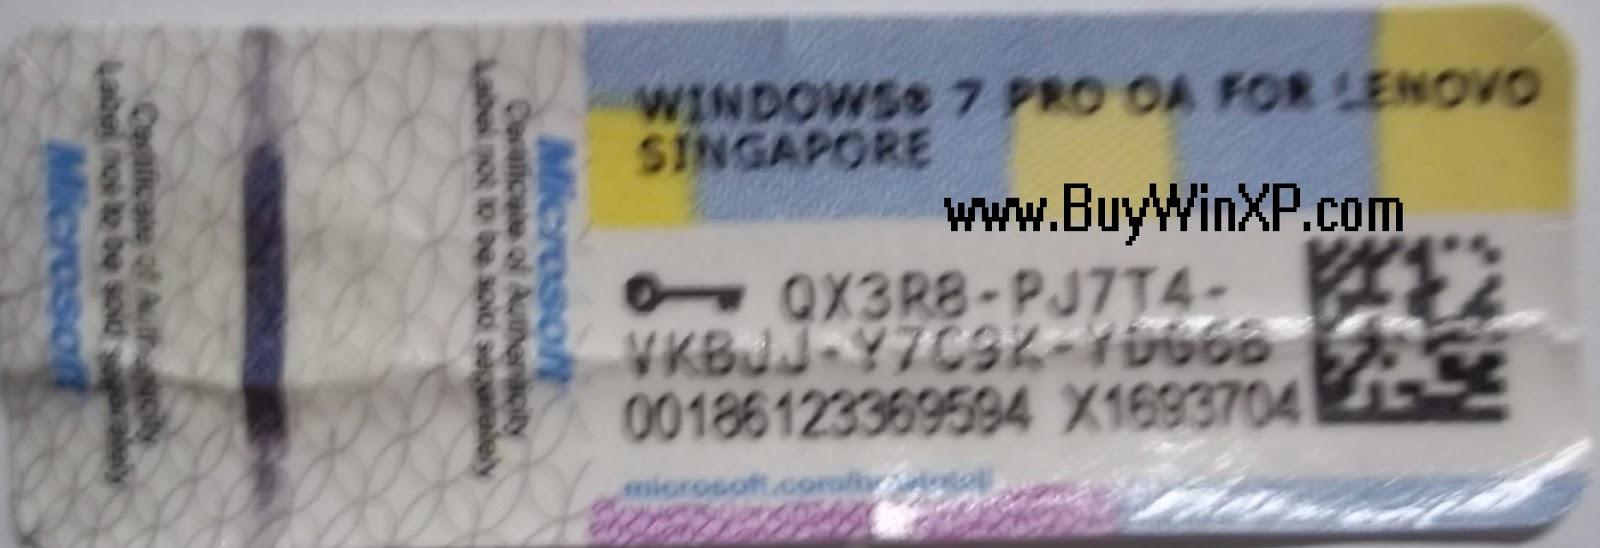 windows 7 activator key free download for 64 bit